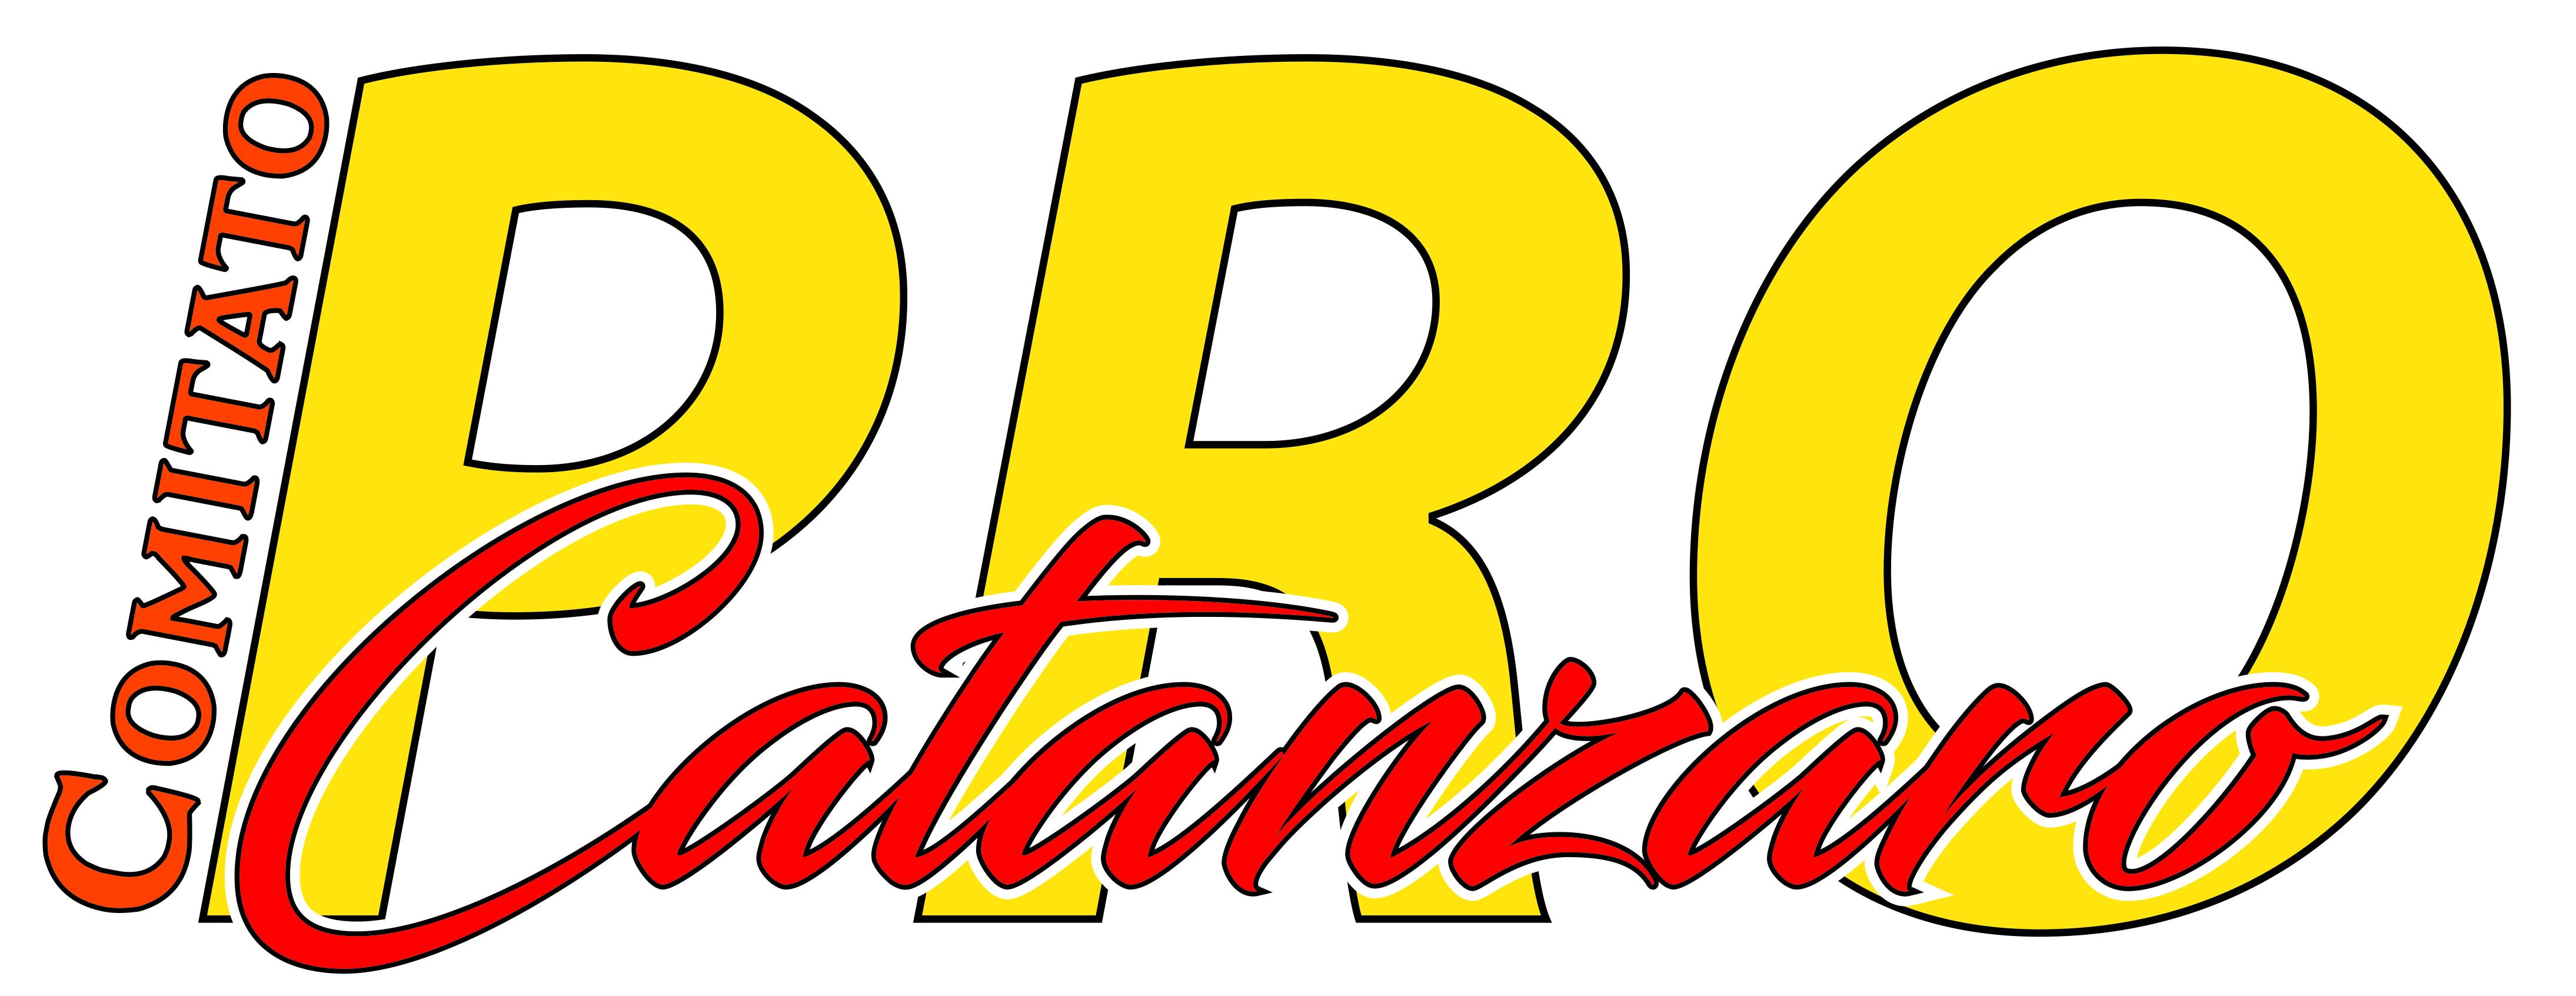 Pro Catanzaro